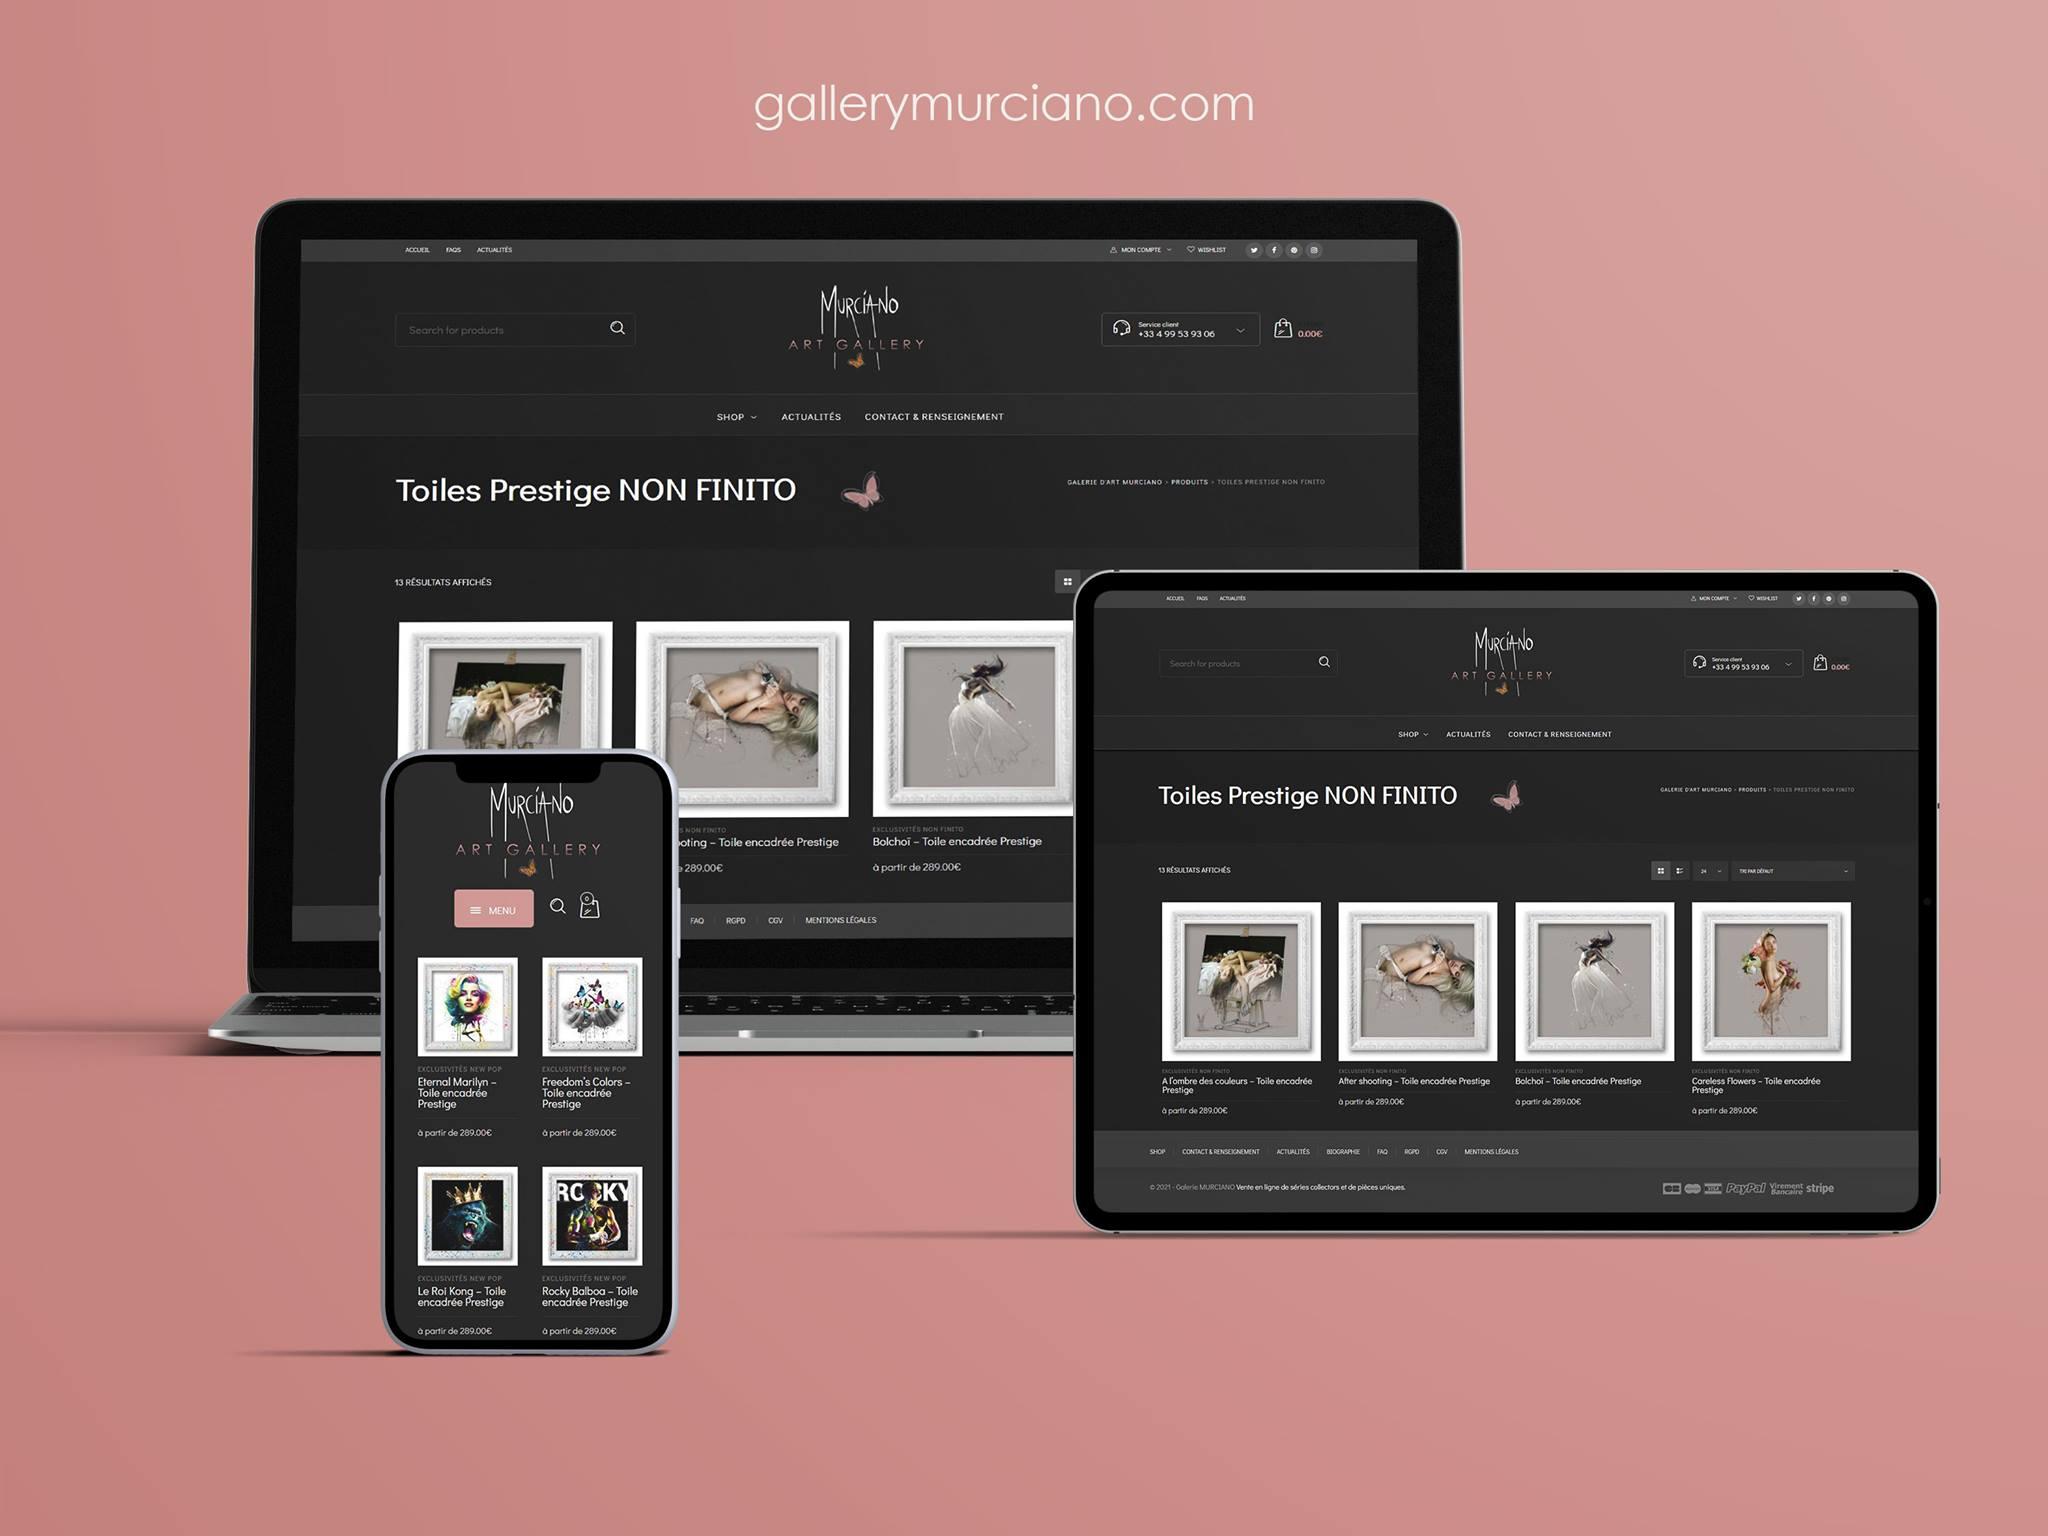 Creation de site internet pour un artiste - peinture patrice murciano